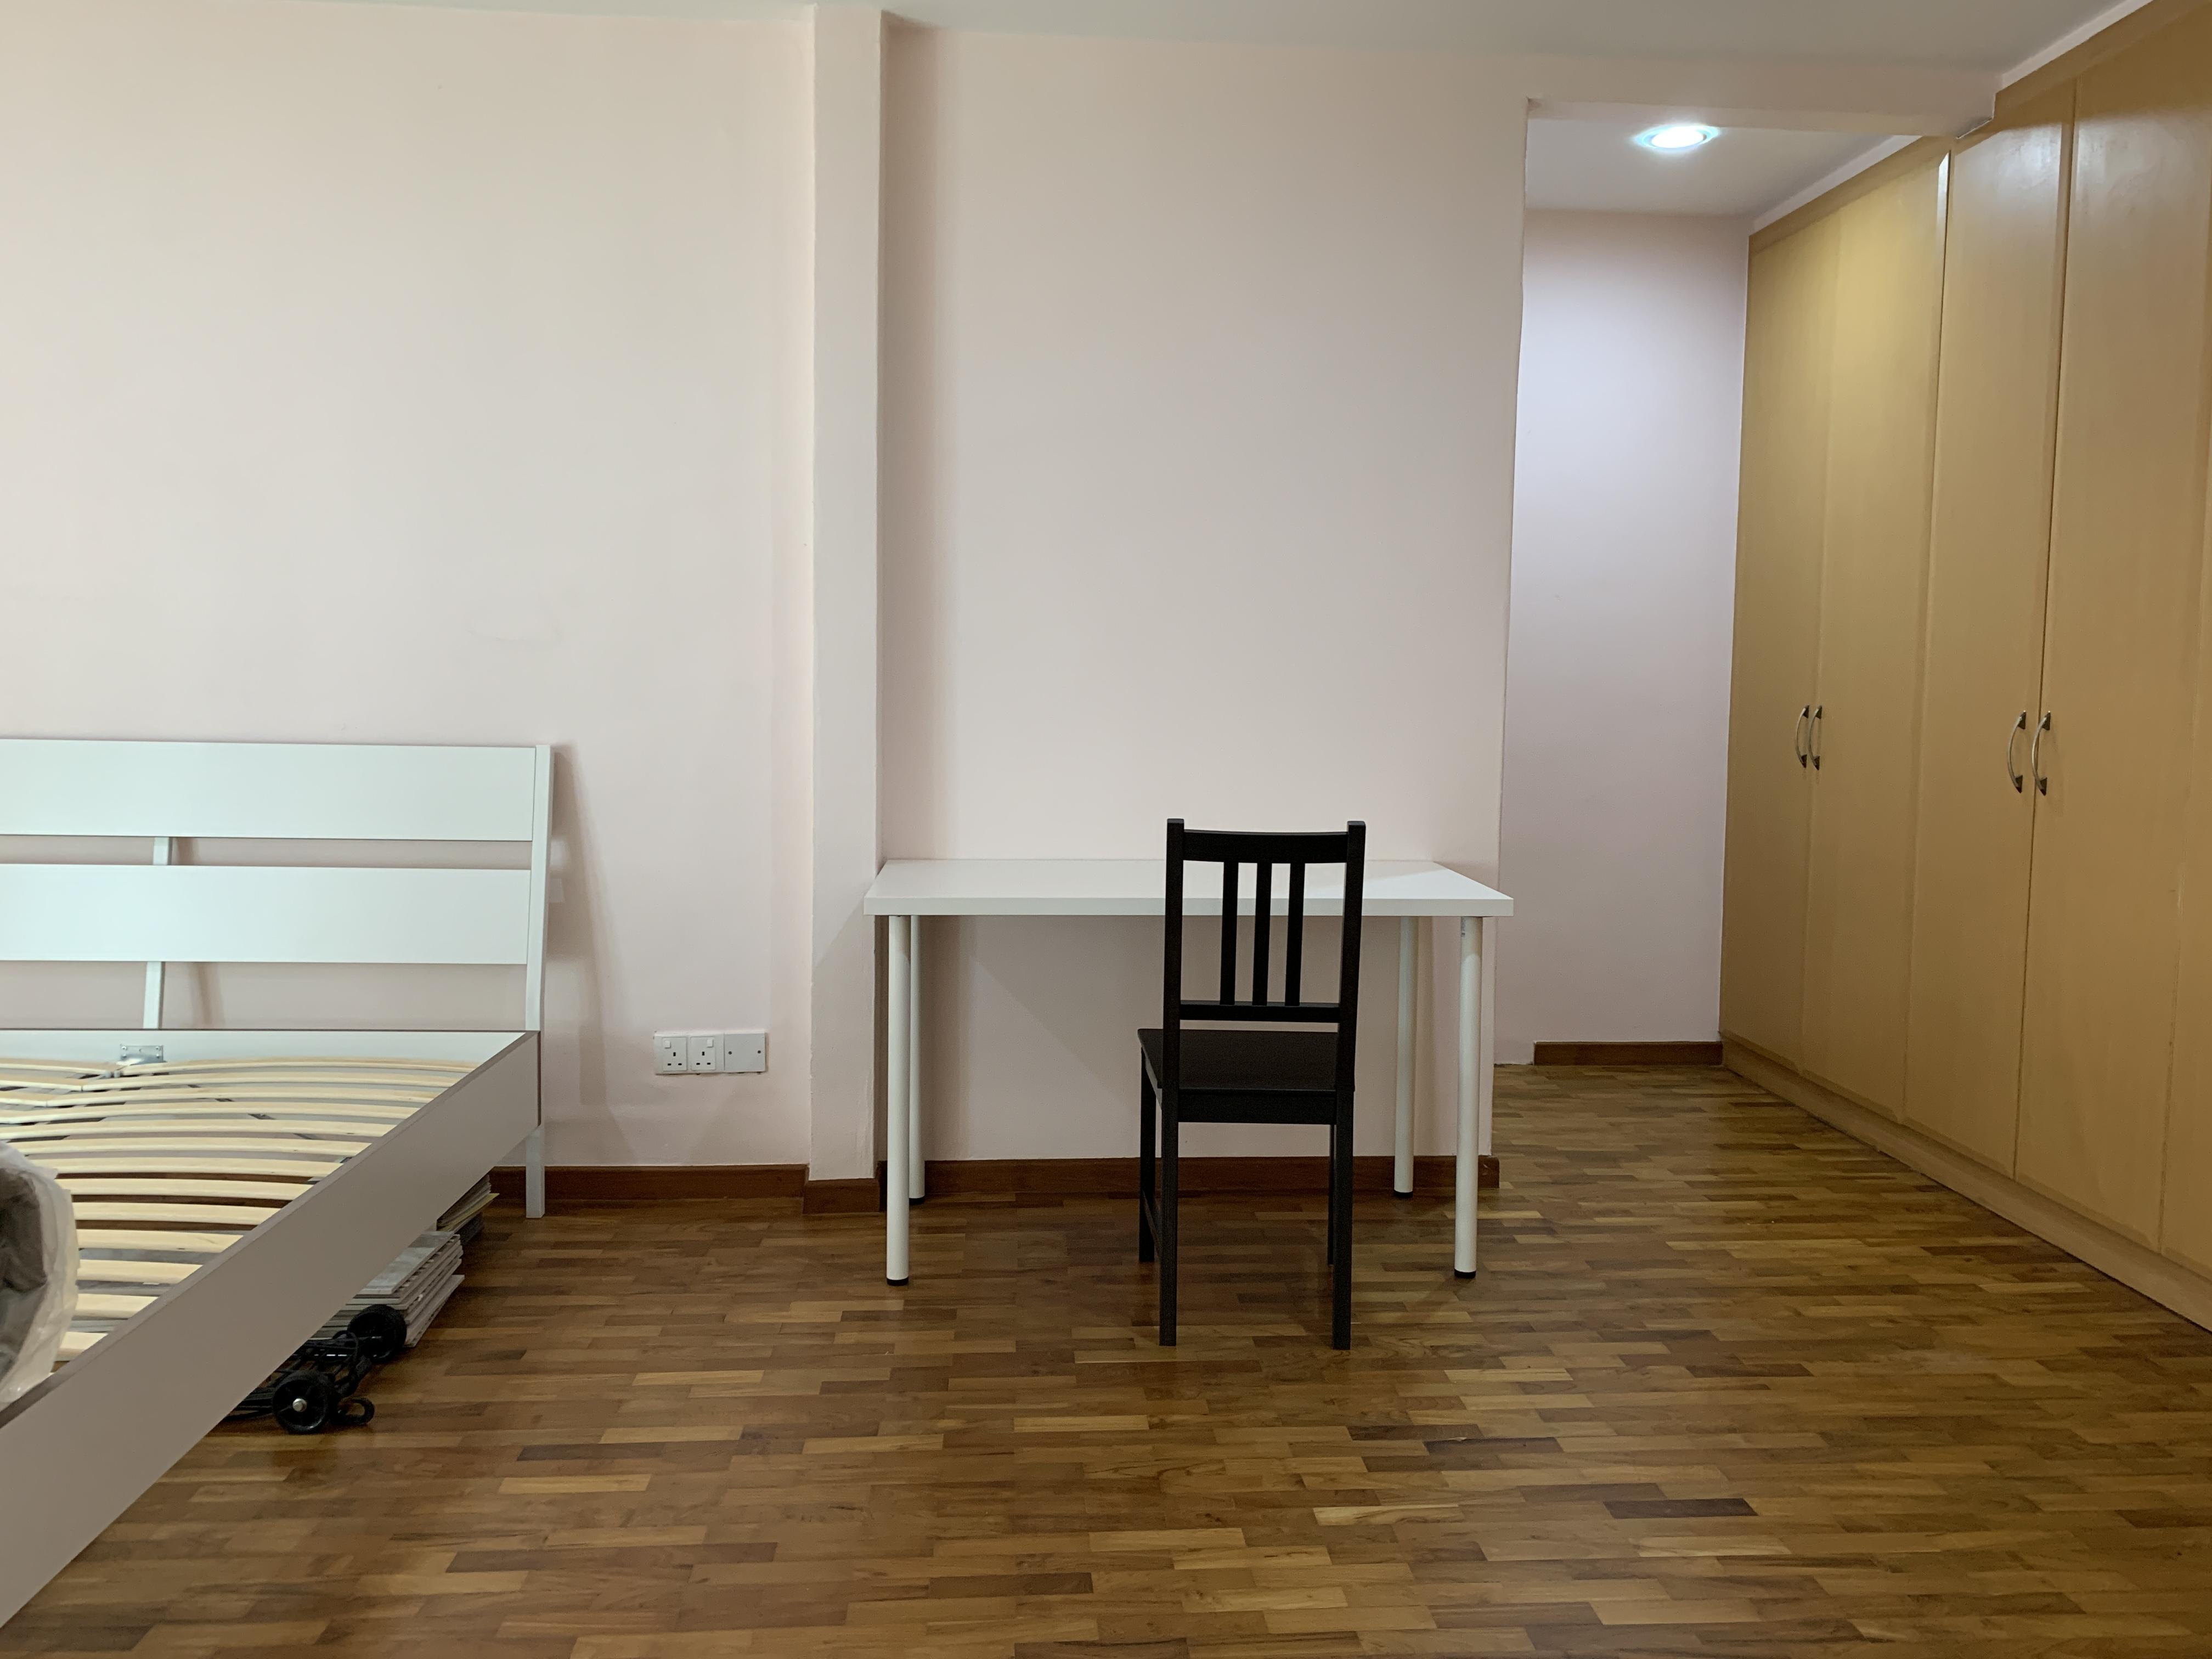 Joo Chiat Masterbedroom Room Rental #128885362